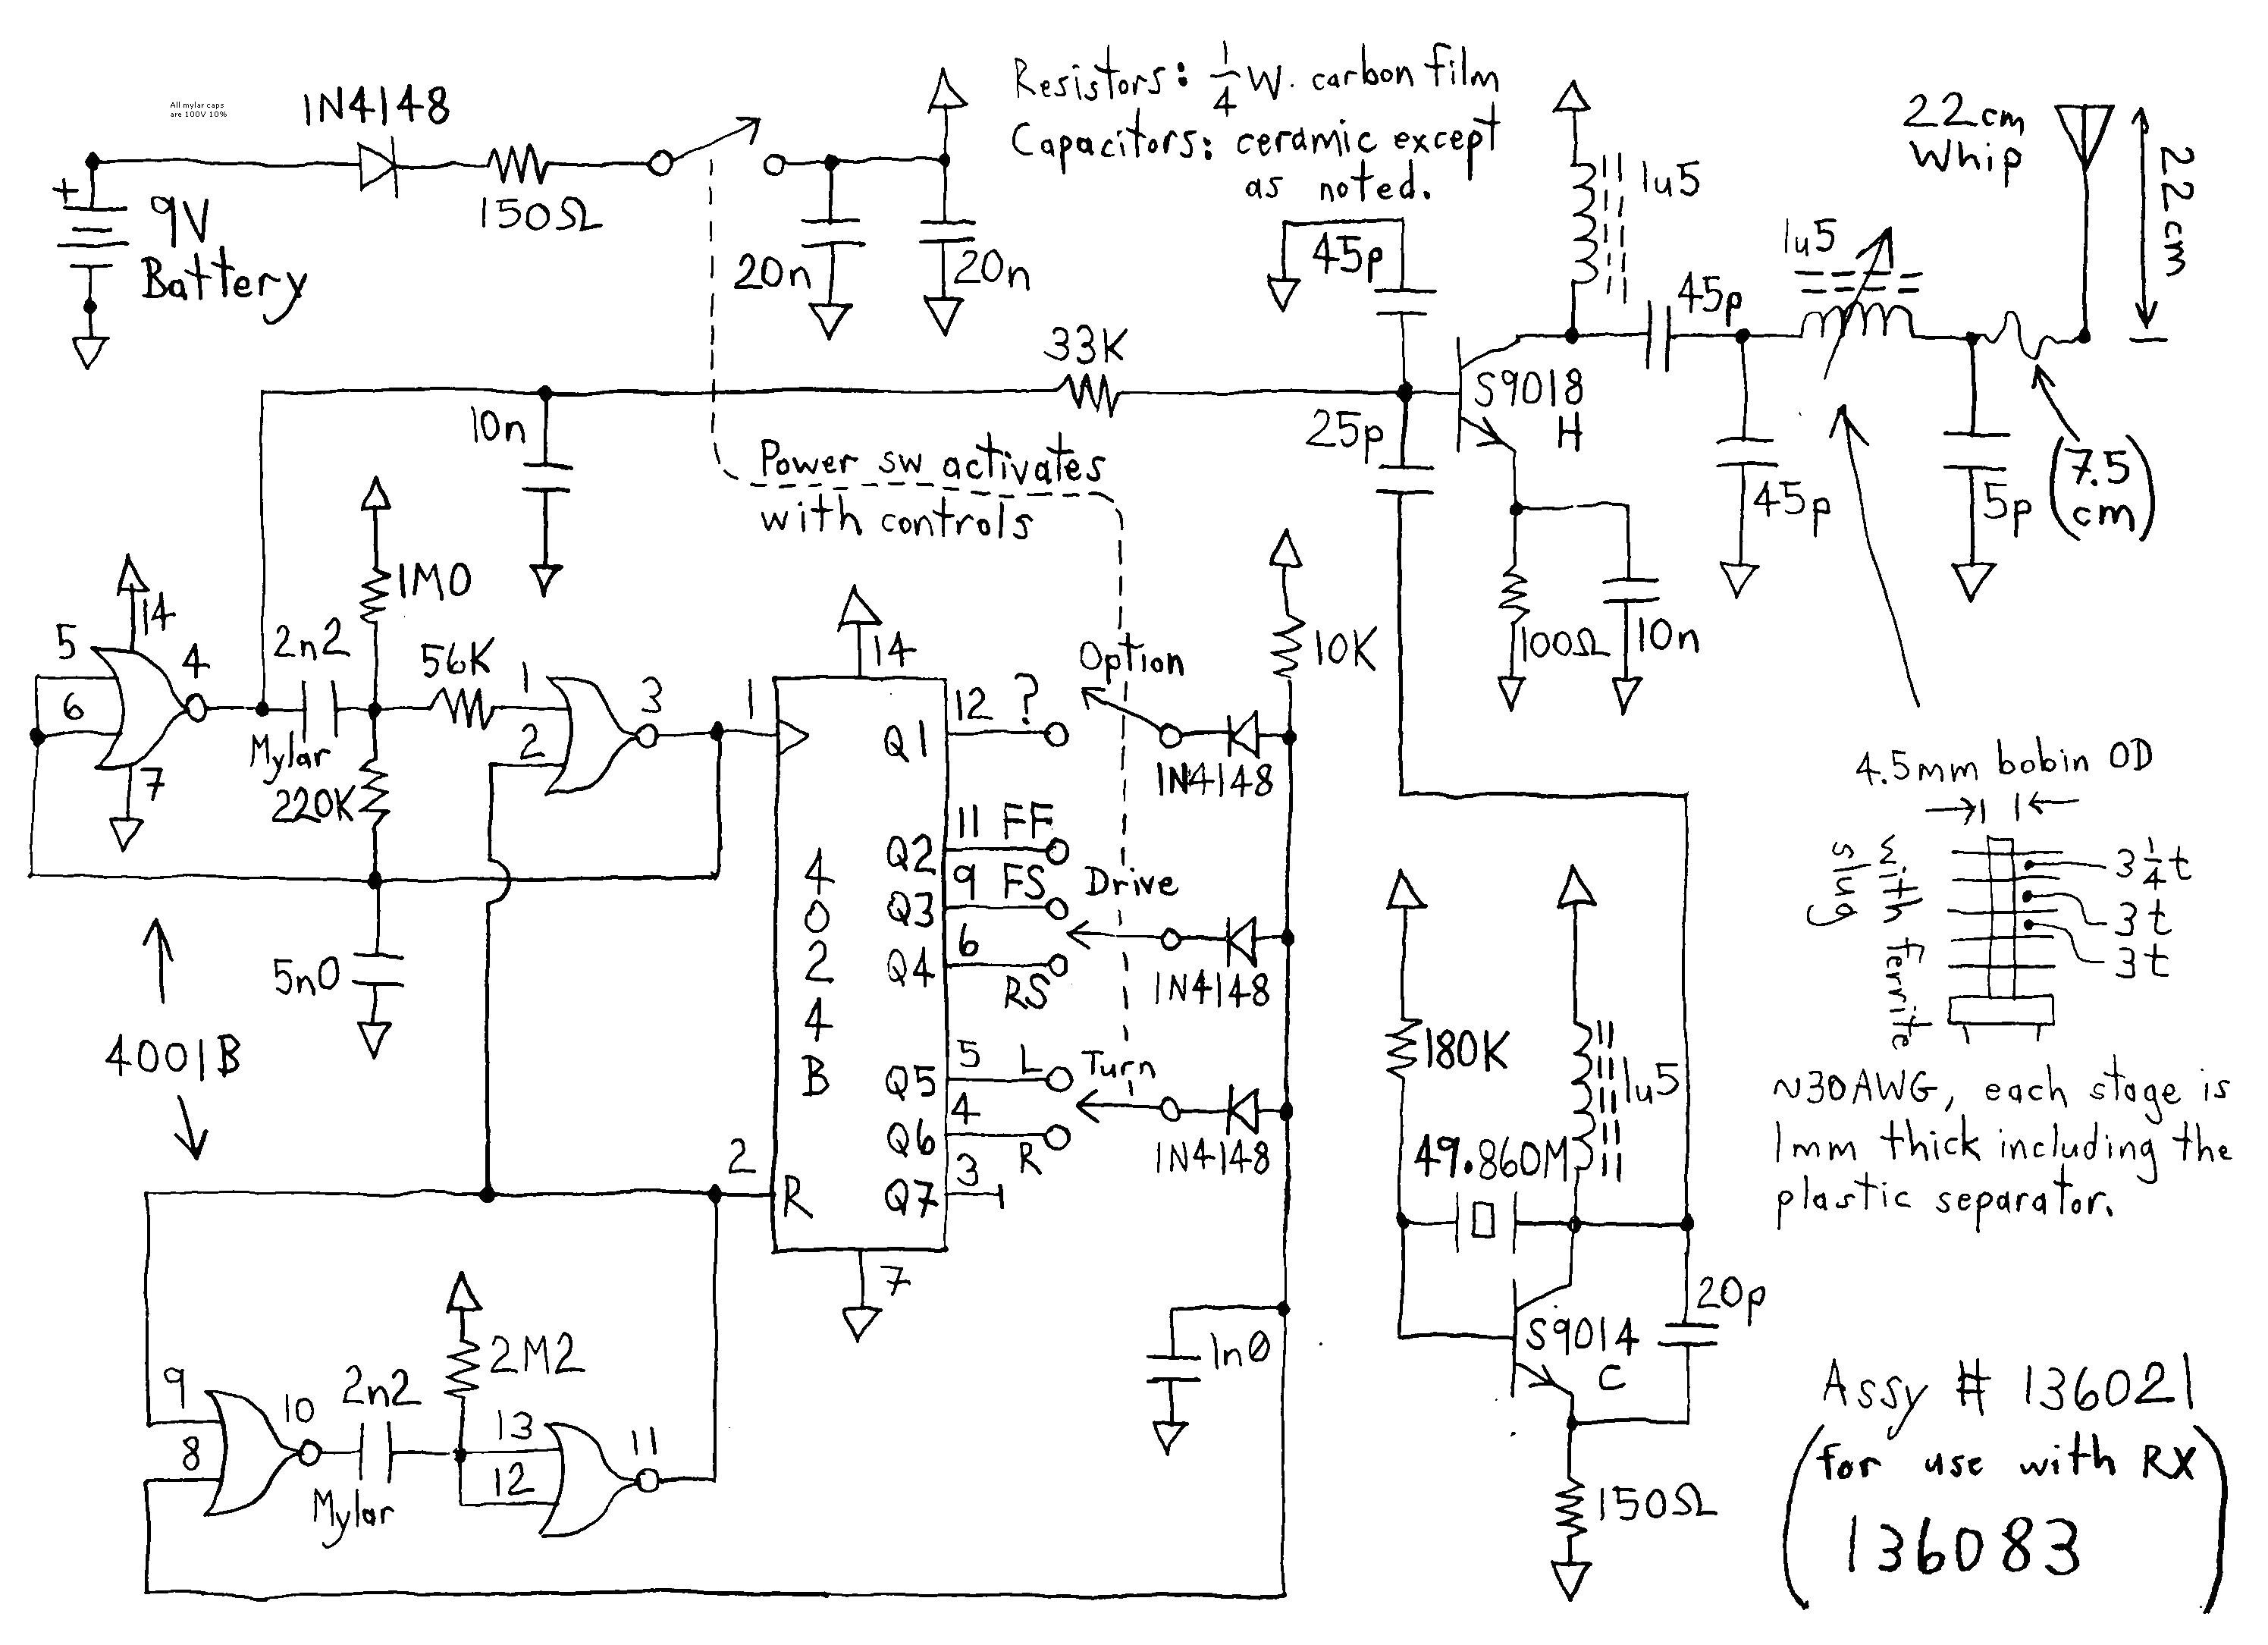 grasshopper 618 wiring diagram fresh ignition switch wiring diagram for grasshopper plete wiring